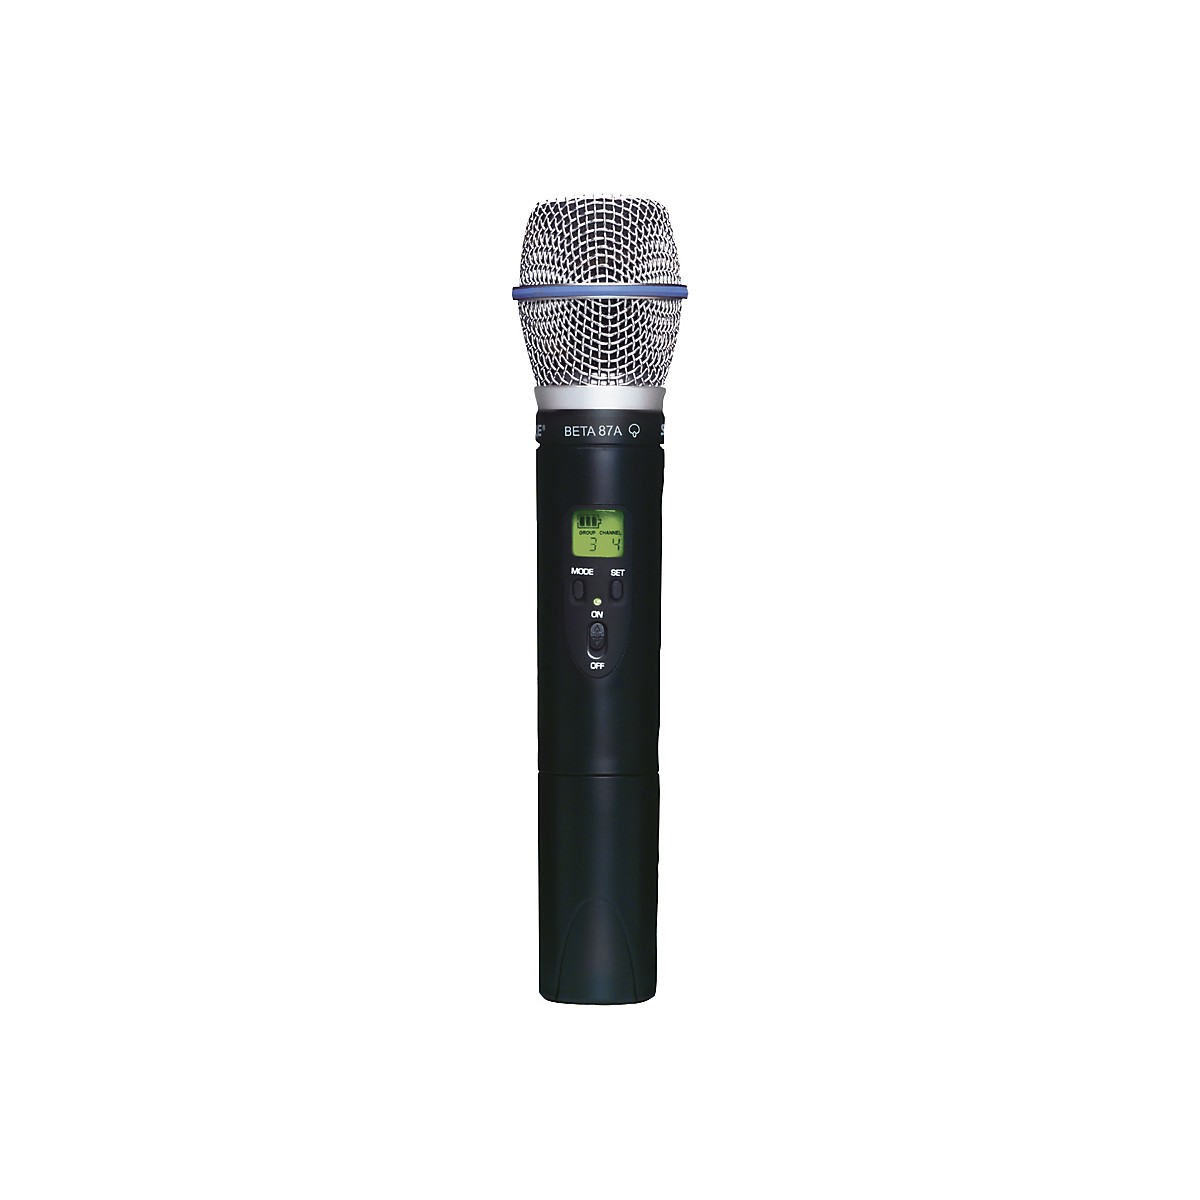 Shure SLX2/BETA87A Wireless Handheld Transmitter Microphone